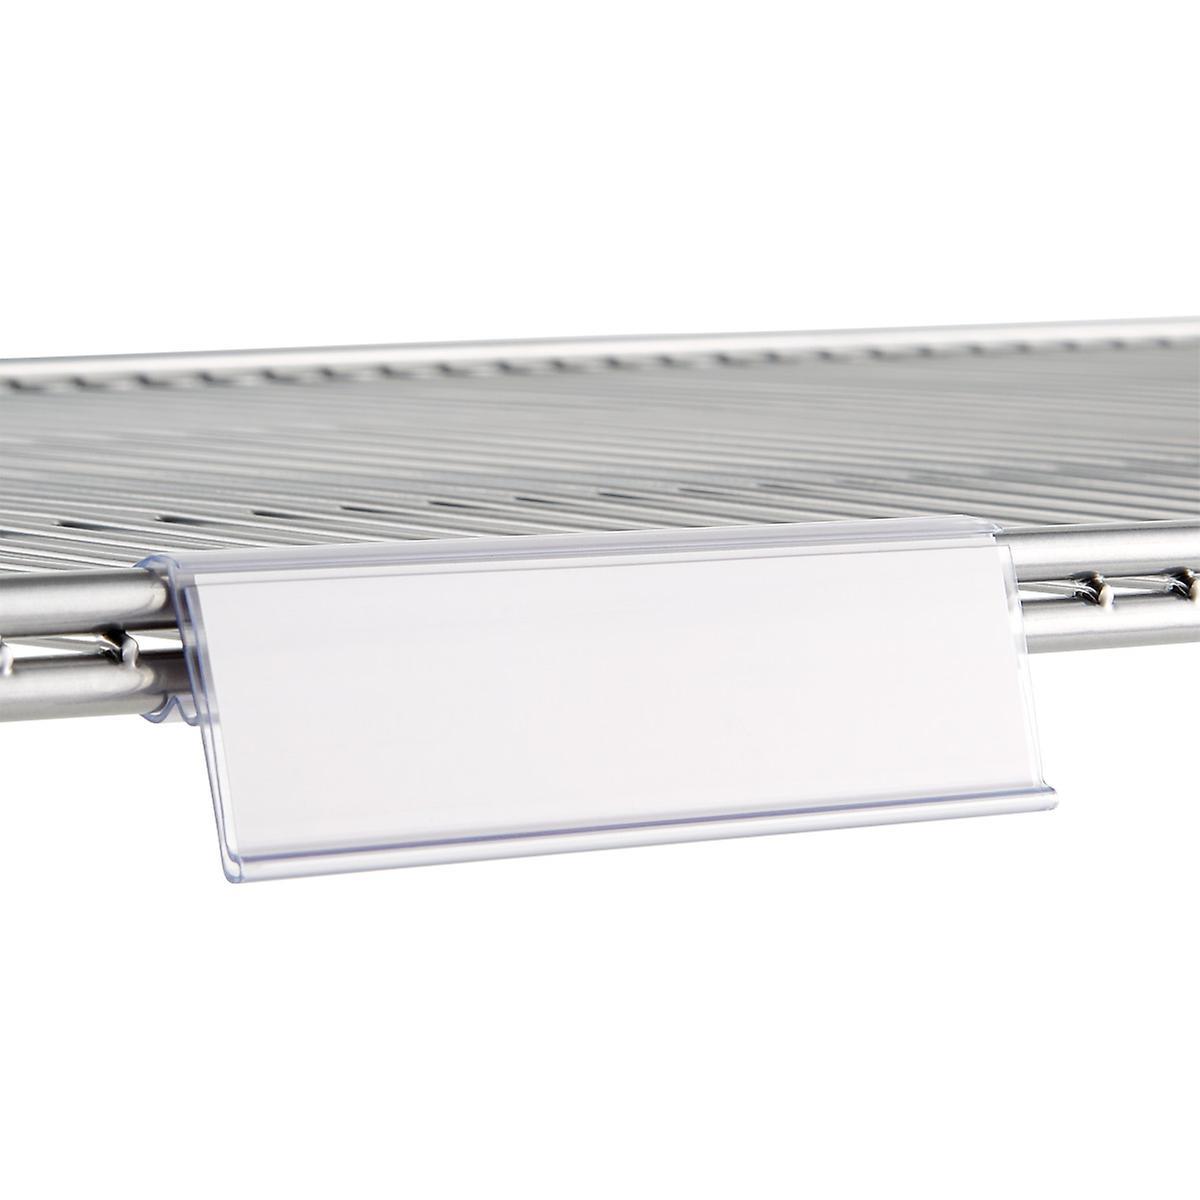 elfa Ventilated Shelf Label Holders